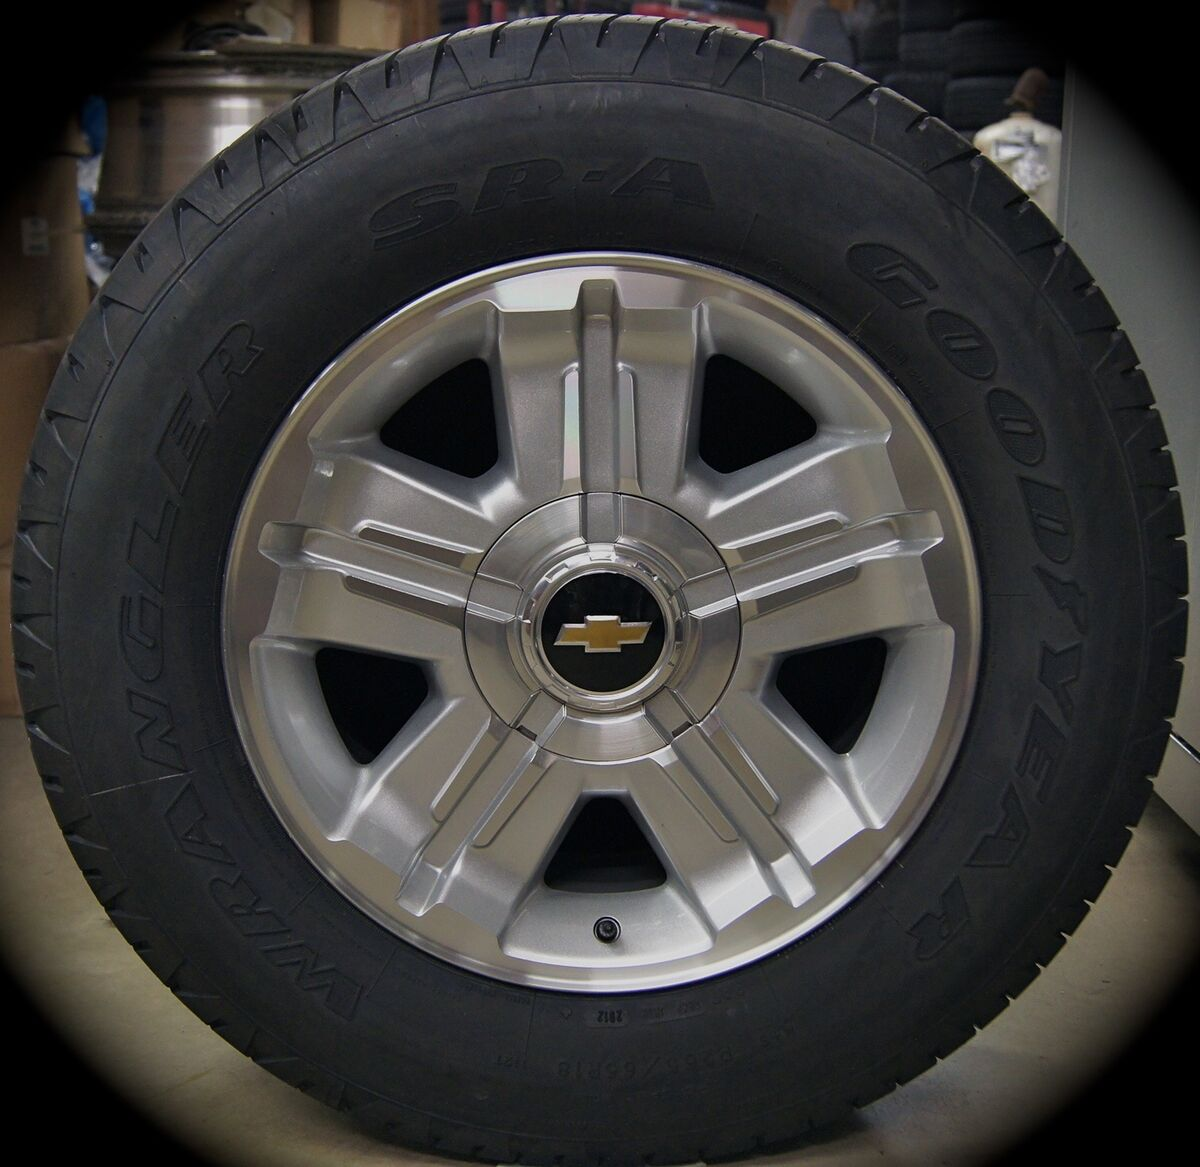 2013 Chevy Z71 Silverado Tahoe Suburban Avalanche 18 Wheels Rims